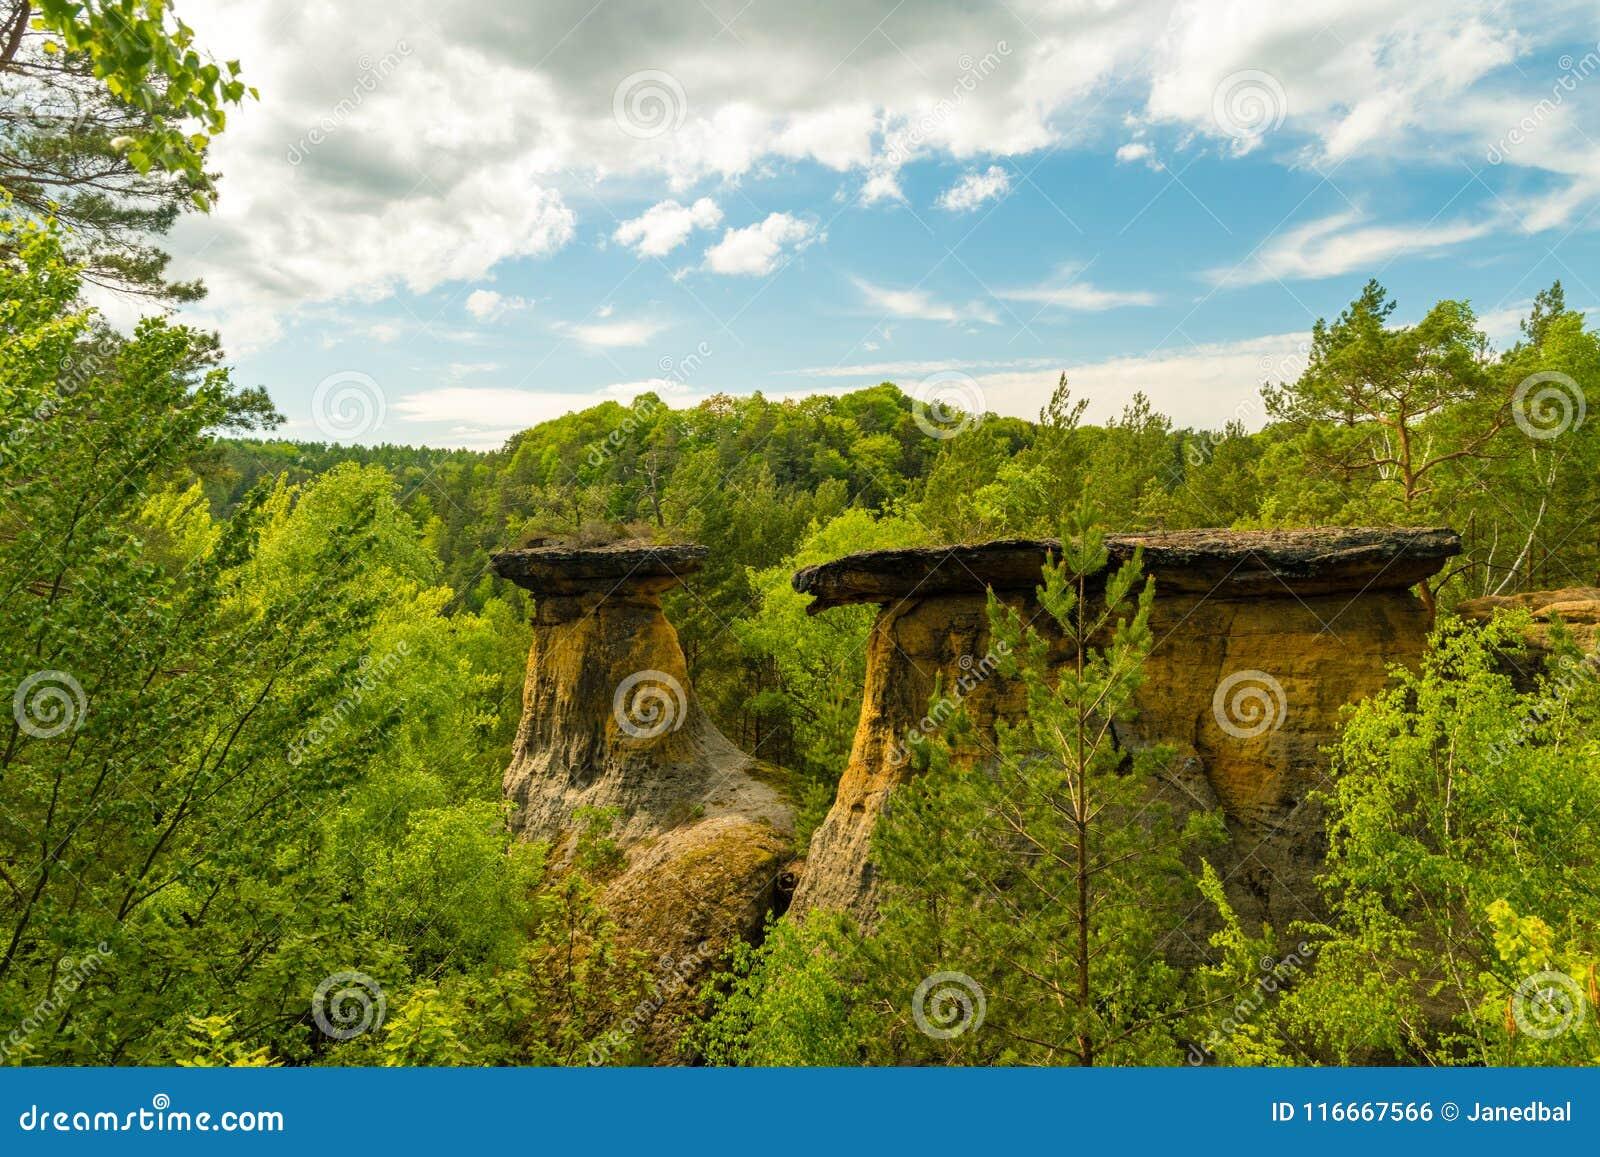 Poklicky砂岩岩石, Kokorinsko, Machuv kraj,被保护的风景地区,捷克共和国